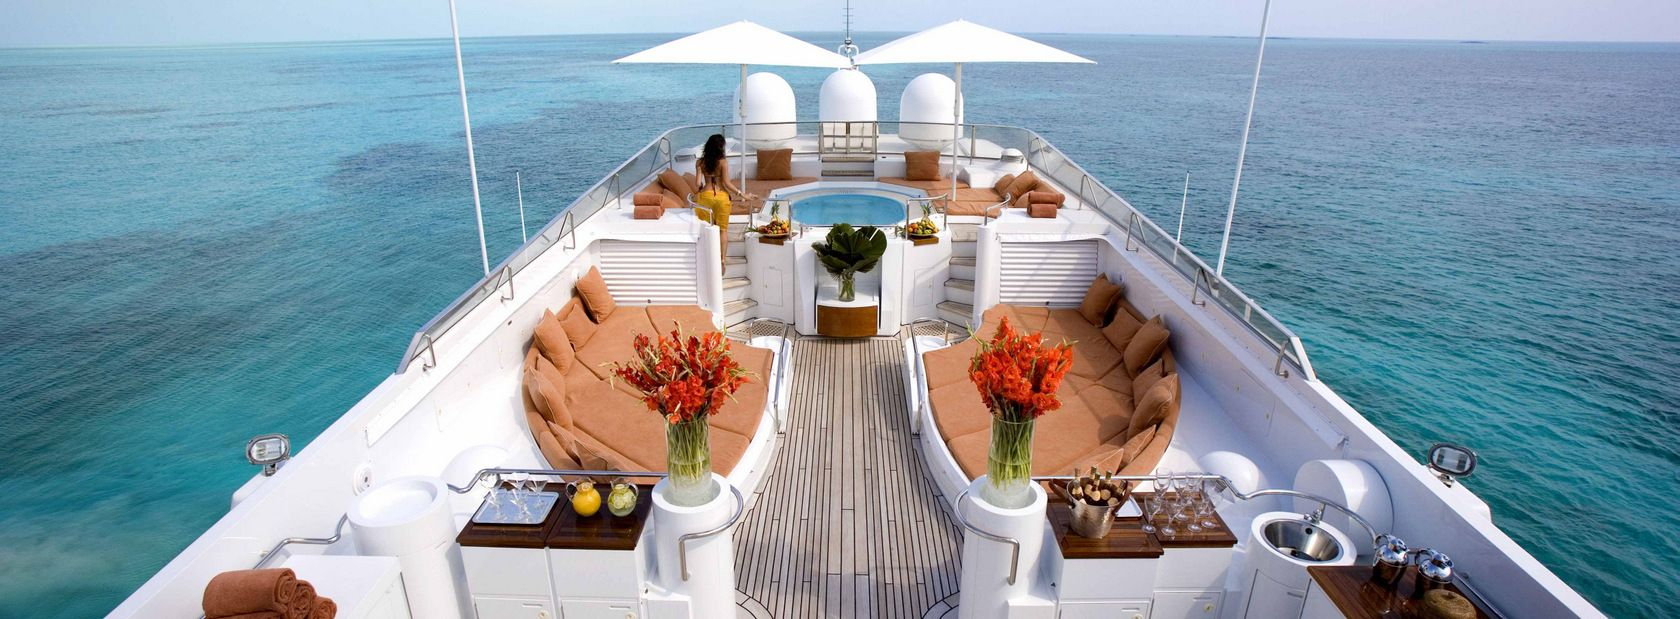 Mediterranean Luxury Yacht Charters Motor Boat Rentals Luxury Yachts Mediterranean Luxury Yacht